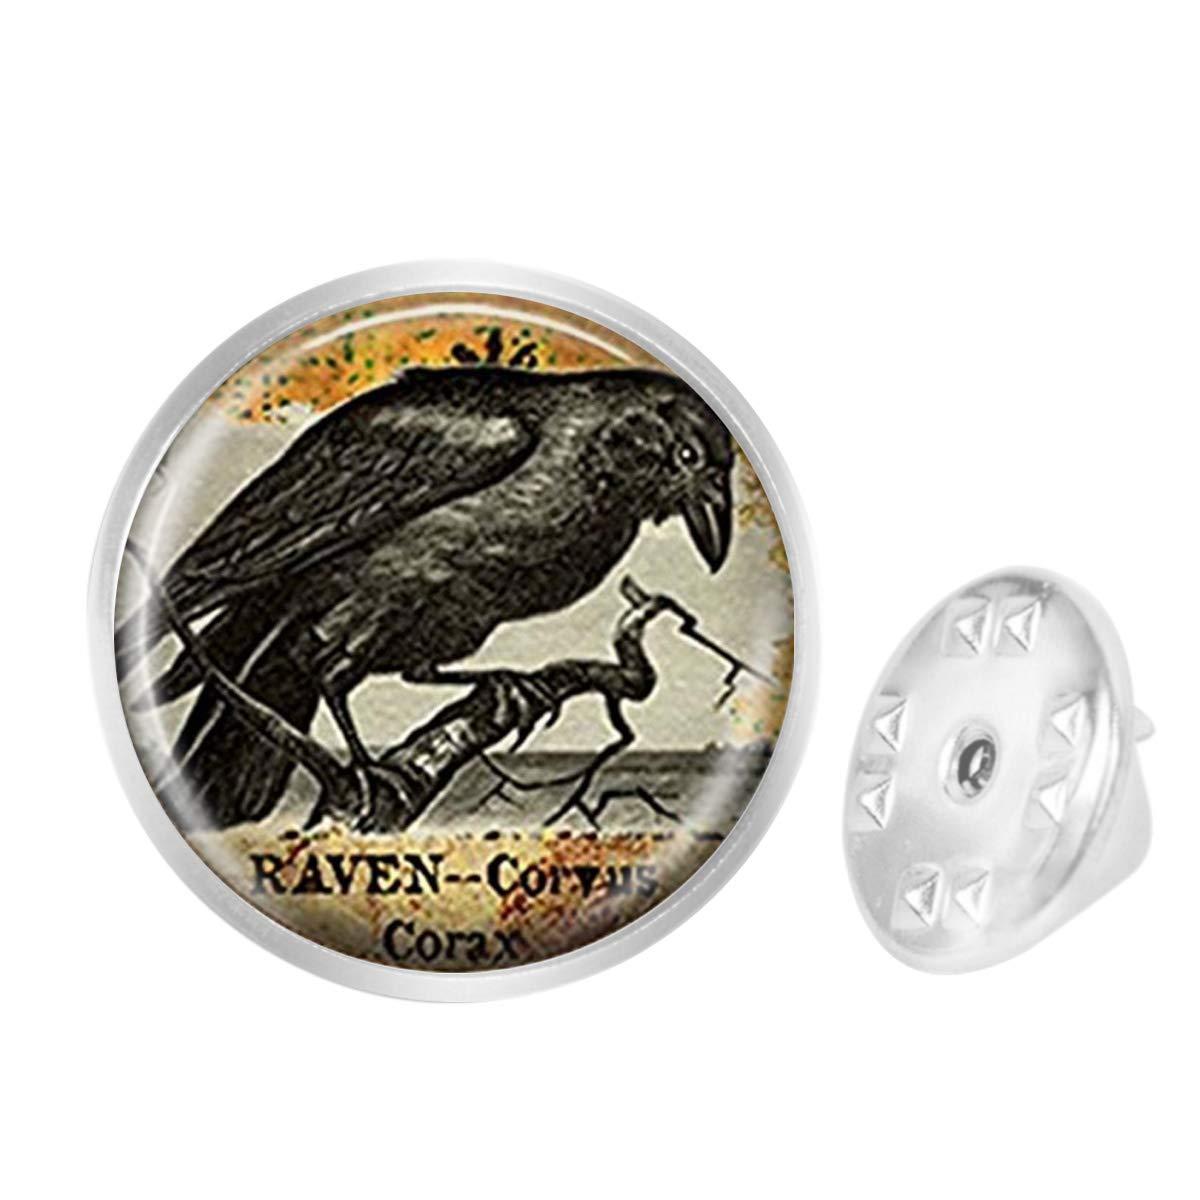 WAZZIT Round Metal Tie Tack Hat Lapel Pin Brooches Raven Goth Halloween Jewelry Blackbird Banquet Badge Enamel Pins Trendy Accessory Jacket T-Shirt